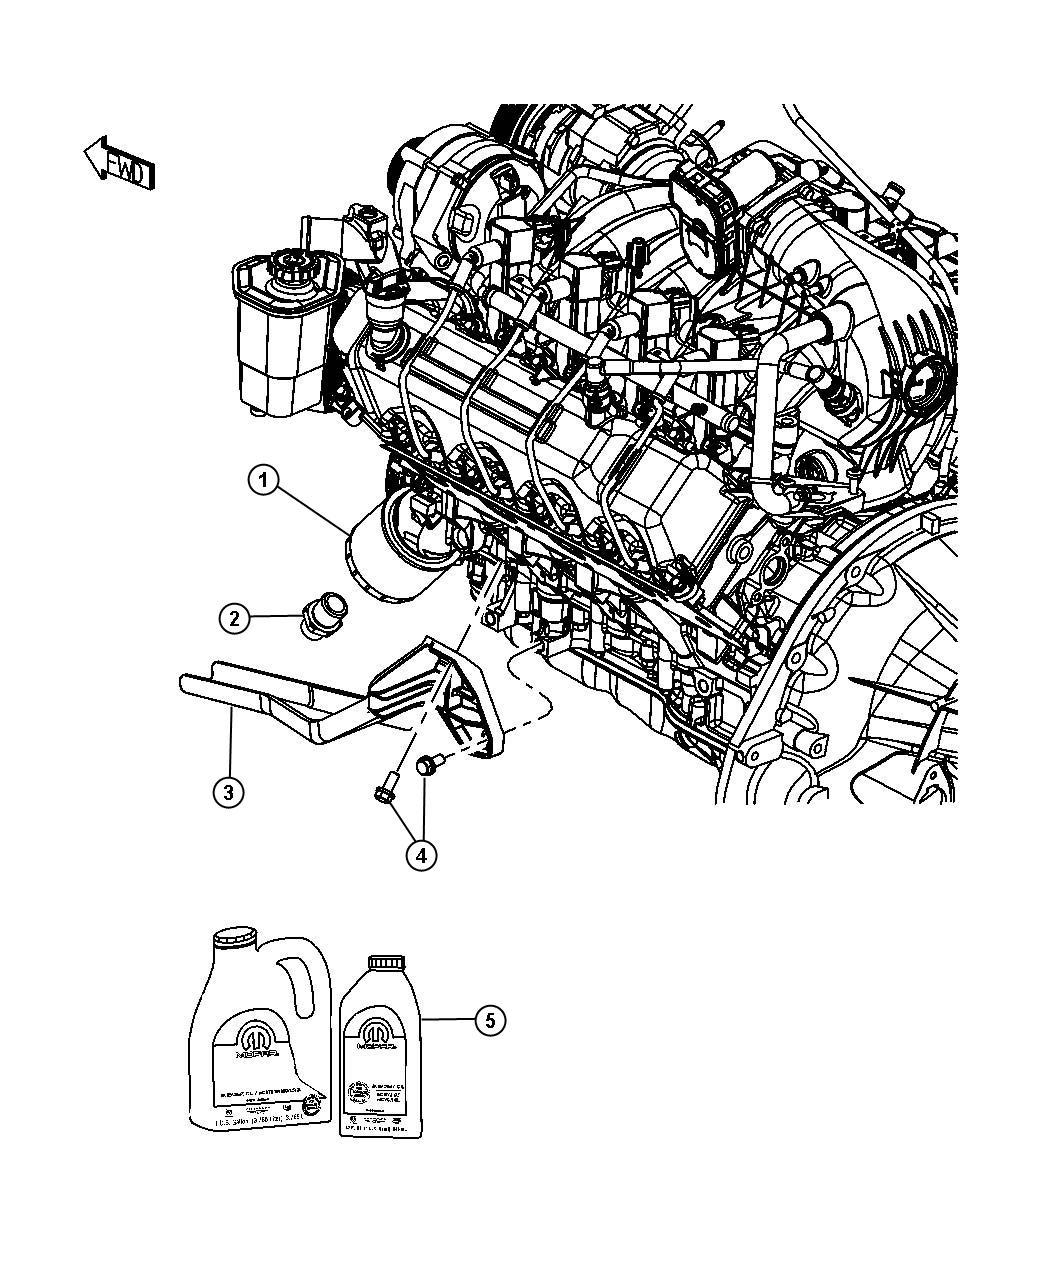 Parts Of An Oil Derrick